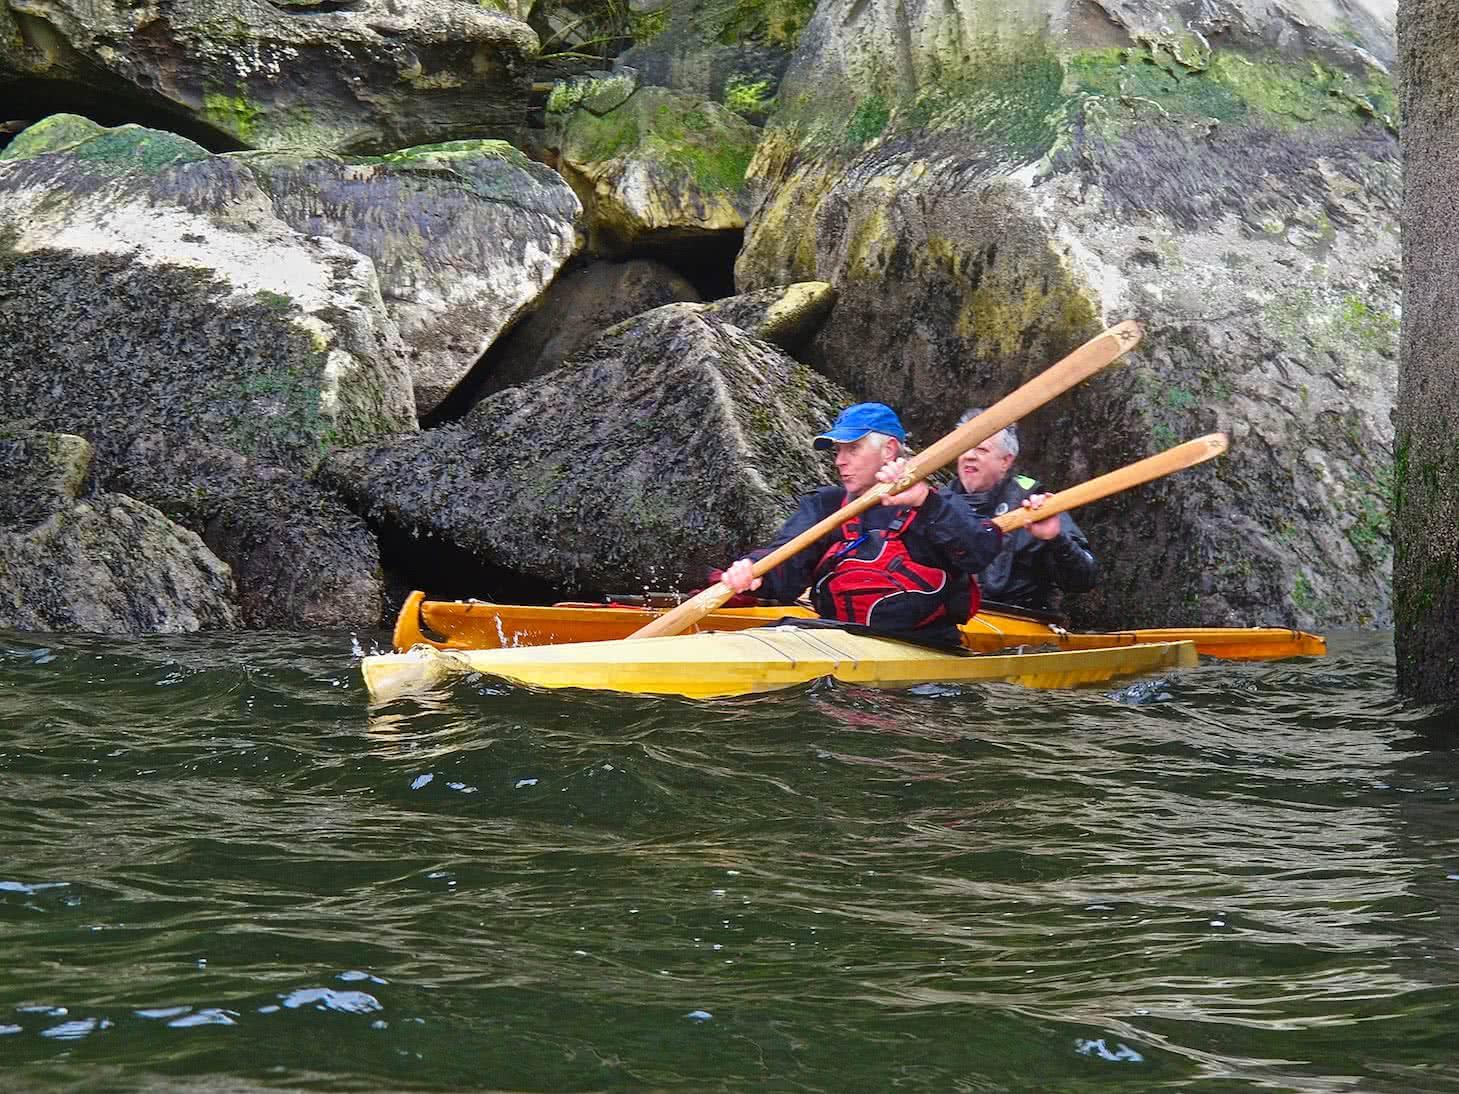 Brian & Ron Crown in tradional kayaks